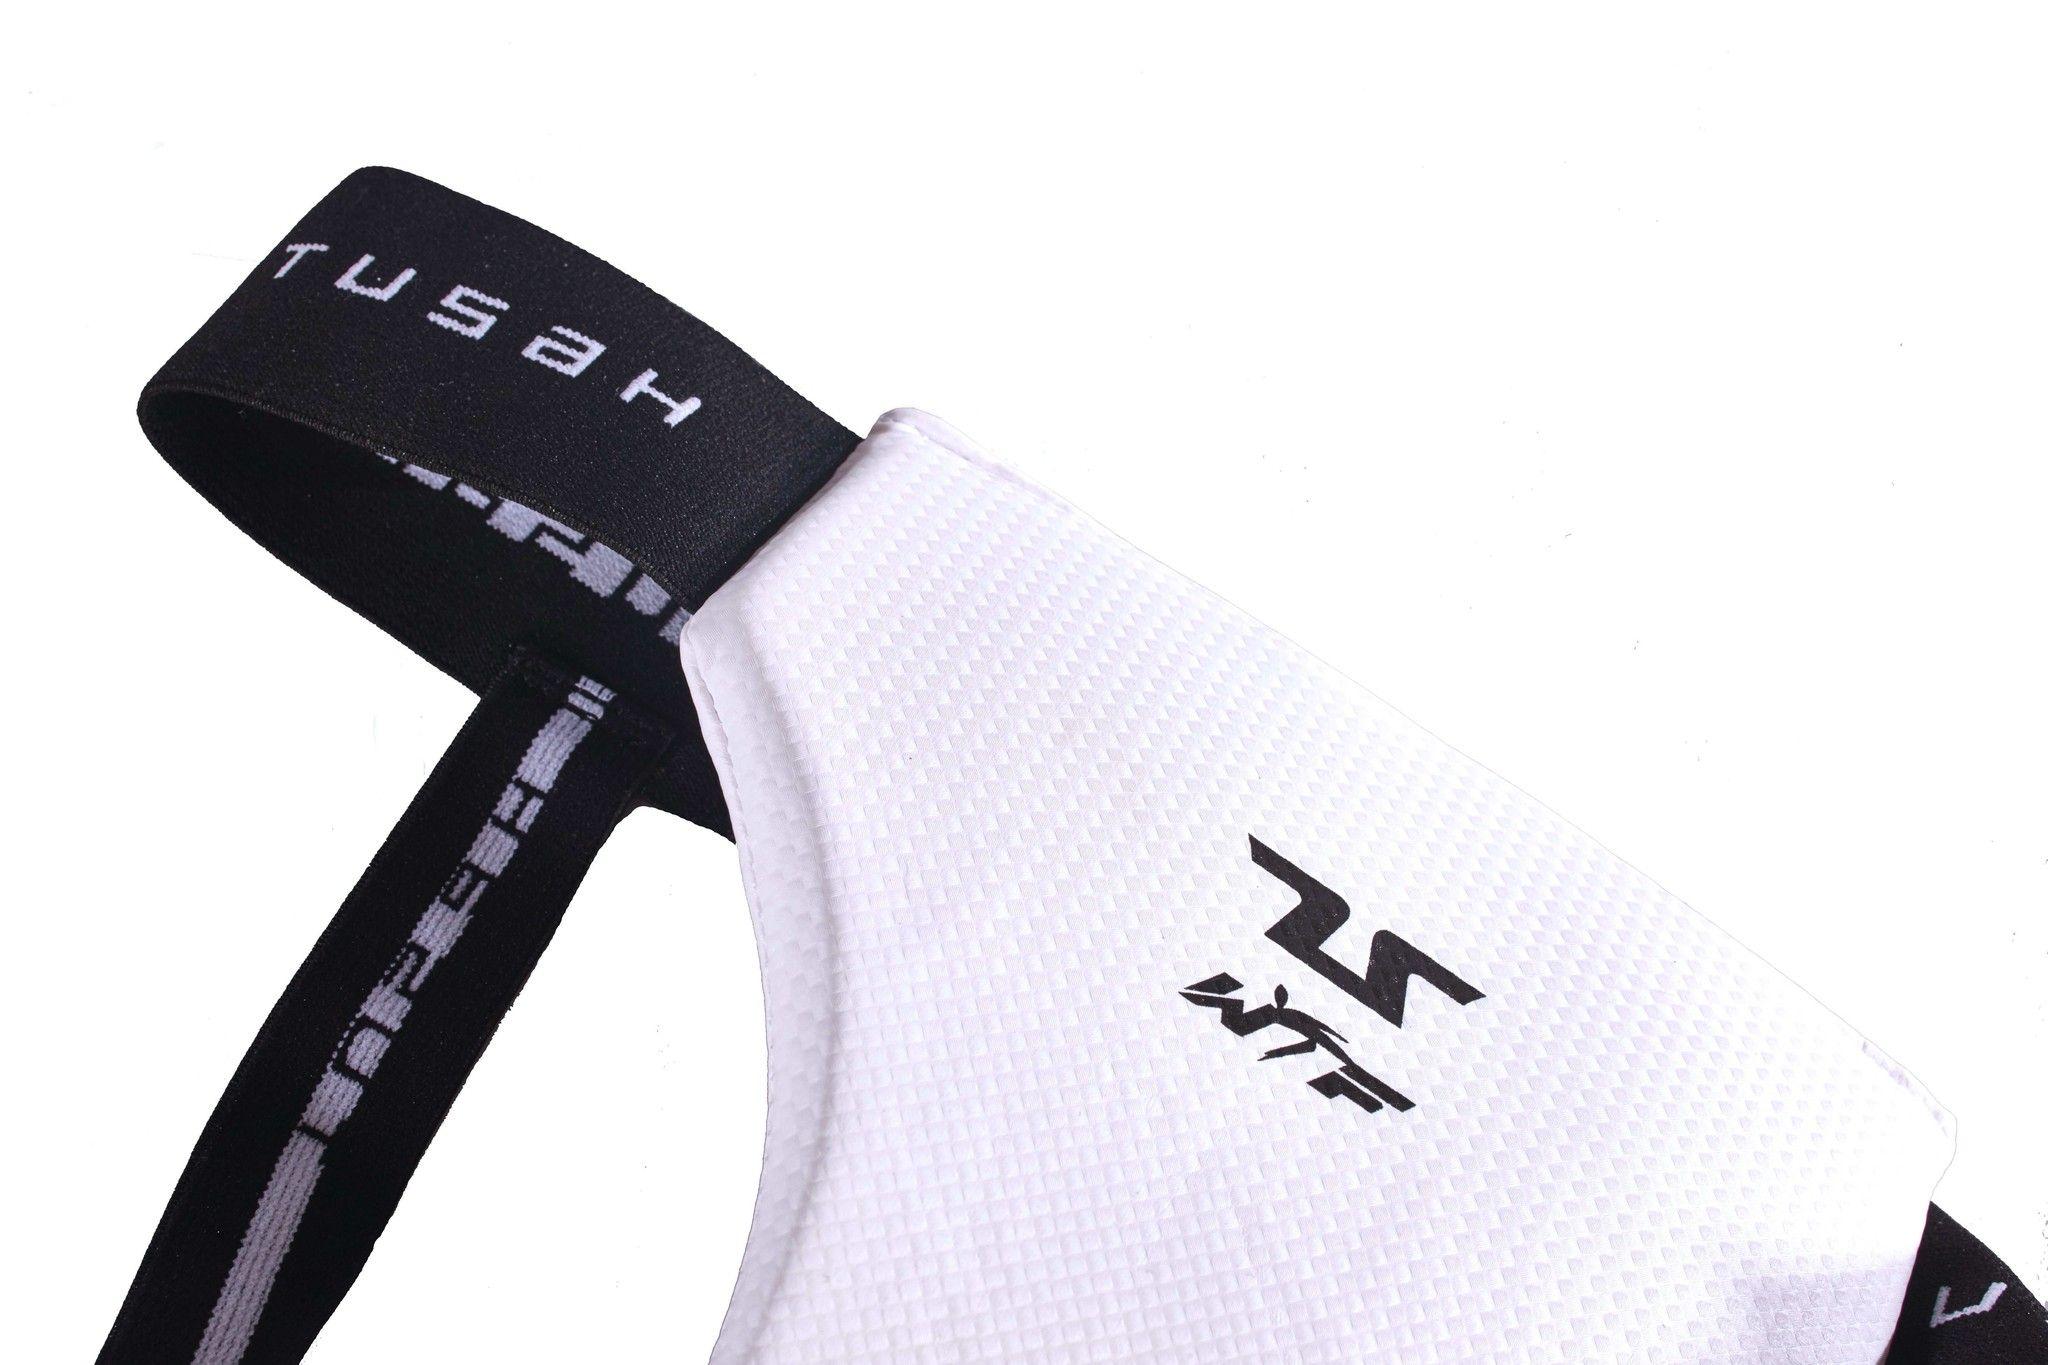 Conchiglia Femminile Tusah per Taekwondo Omologata WT WTF protezione inguine